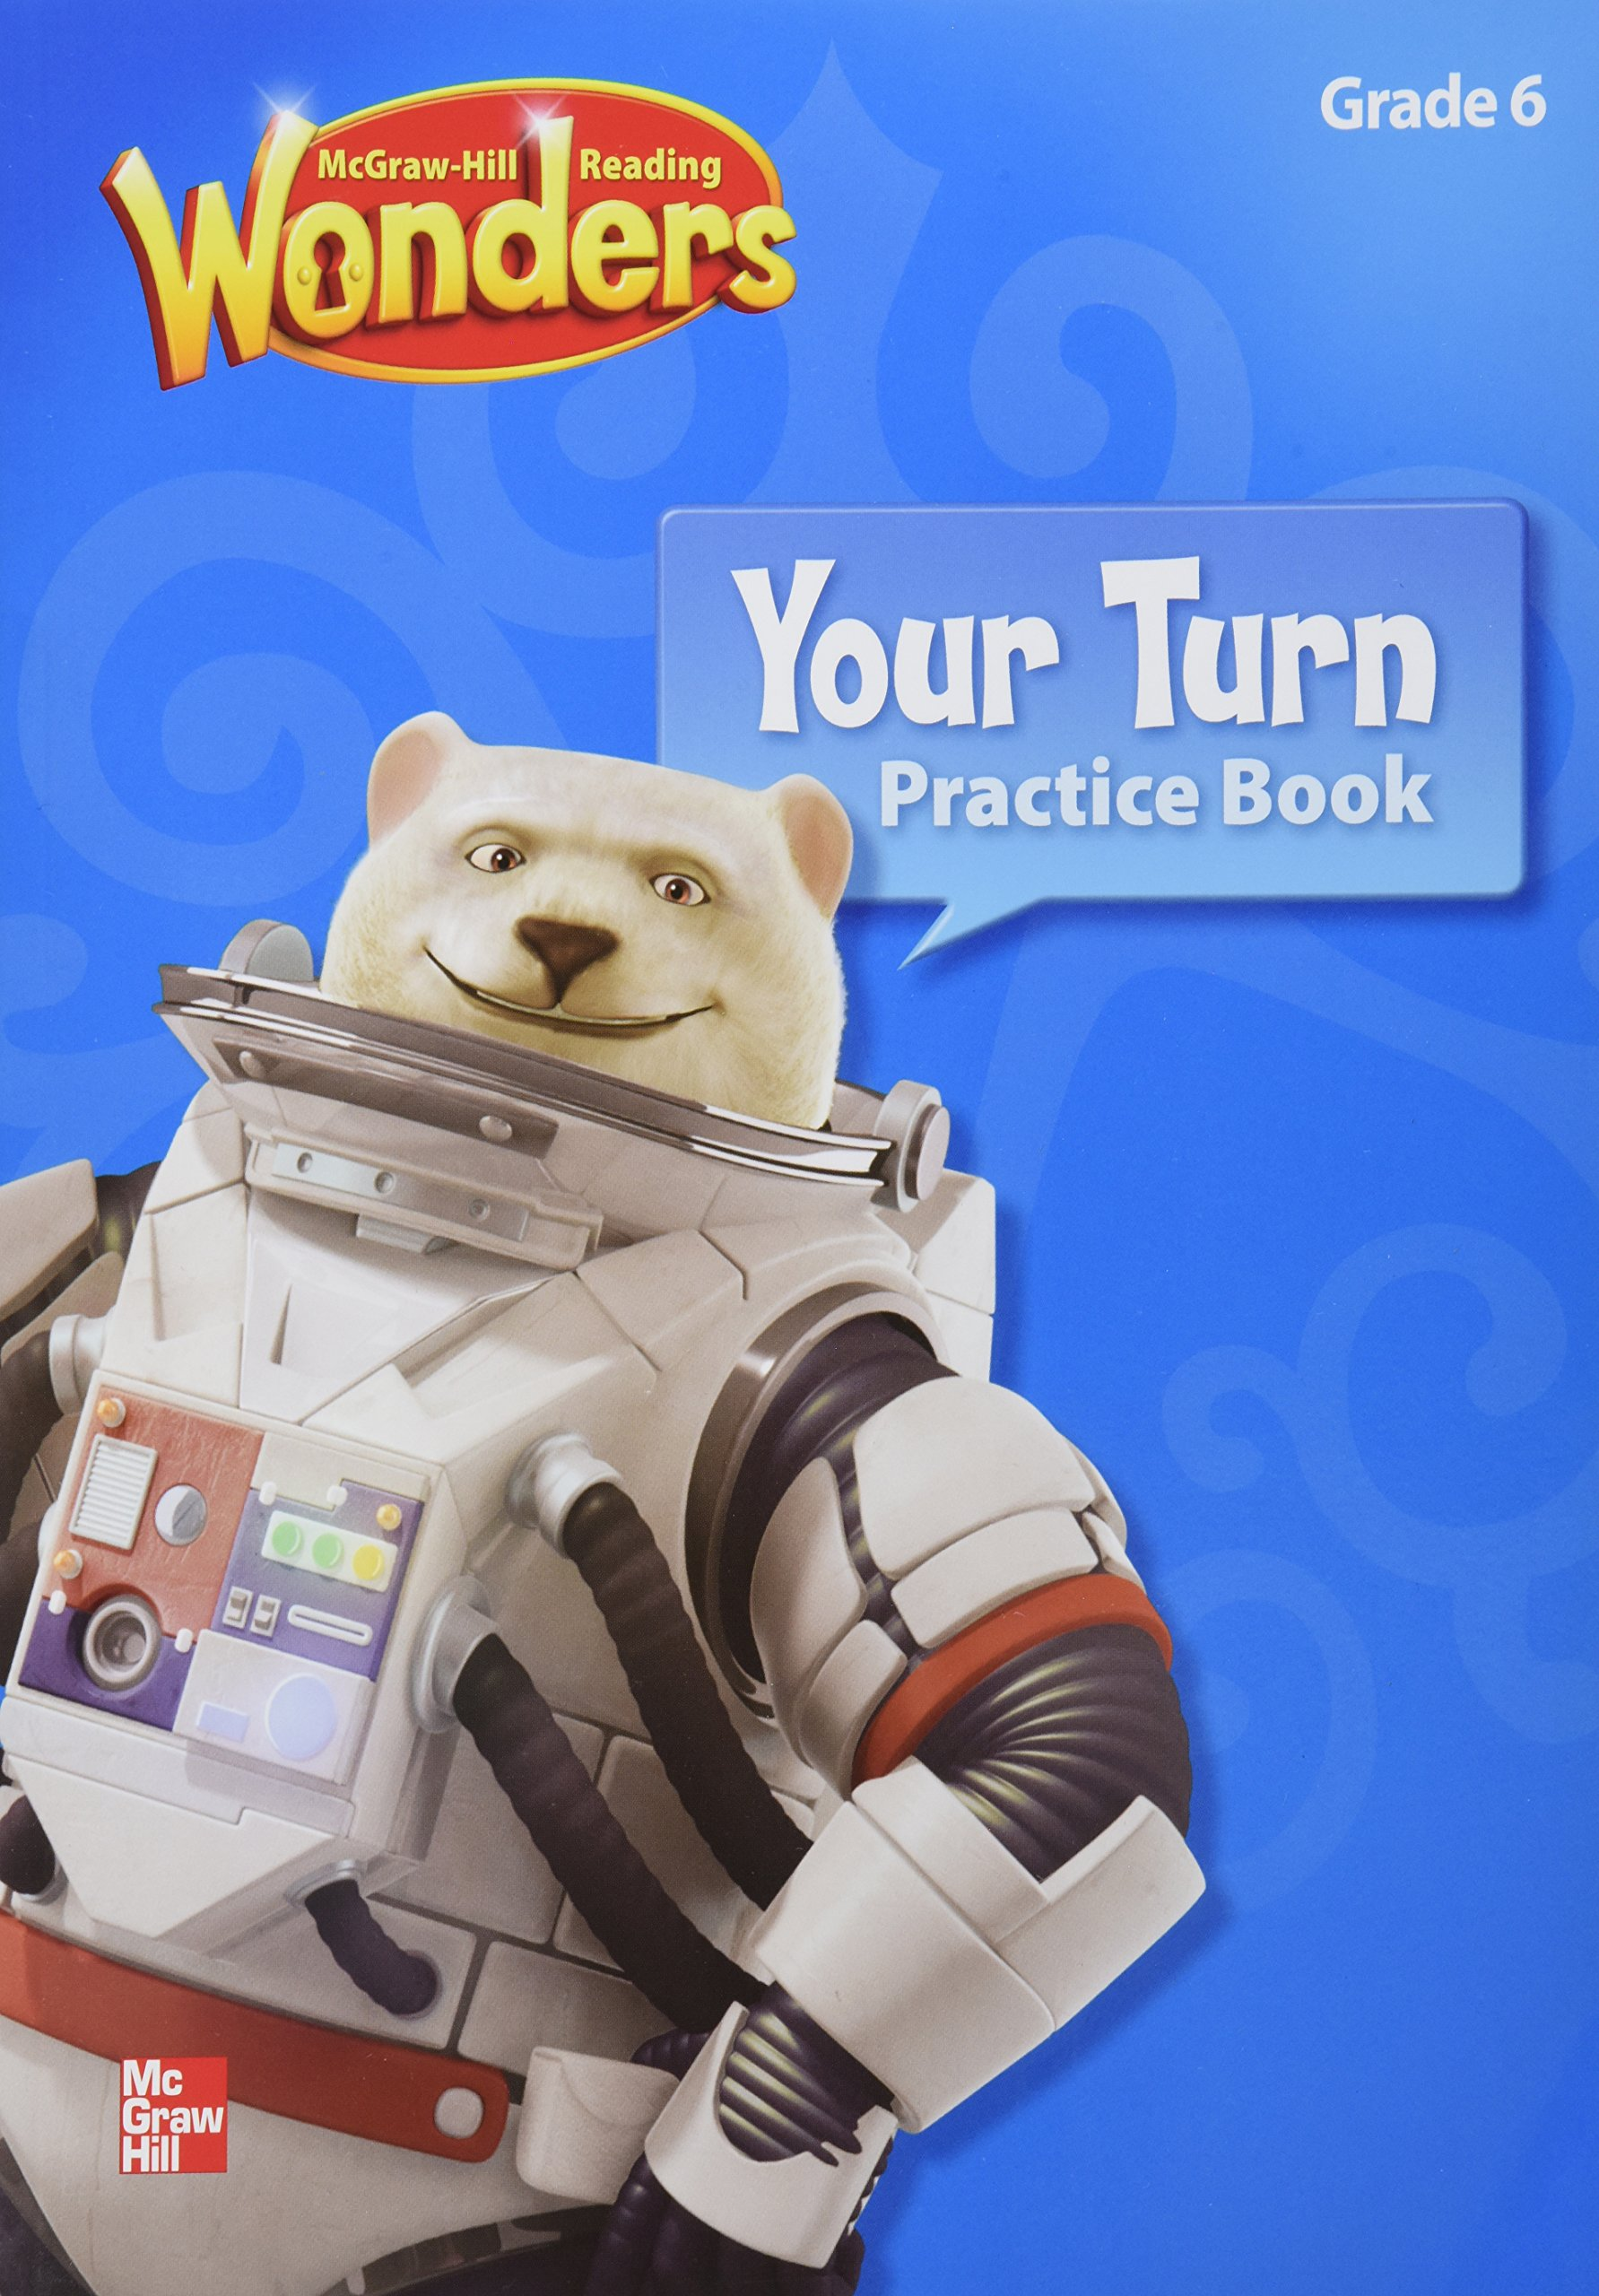 Reading Wonders, Grade 6, Your Turn Practice Book: McGraw